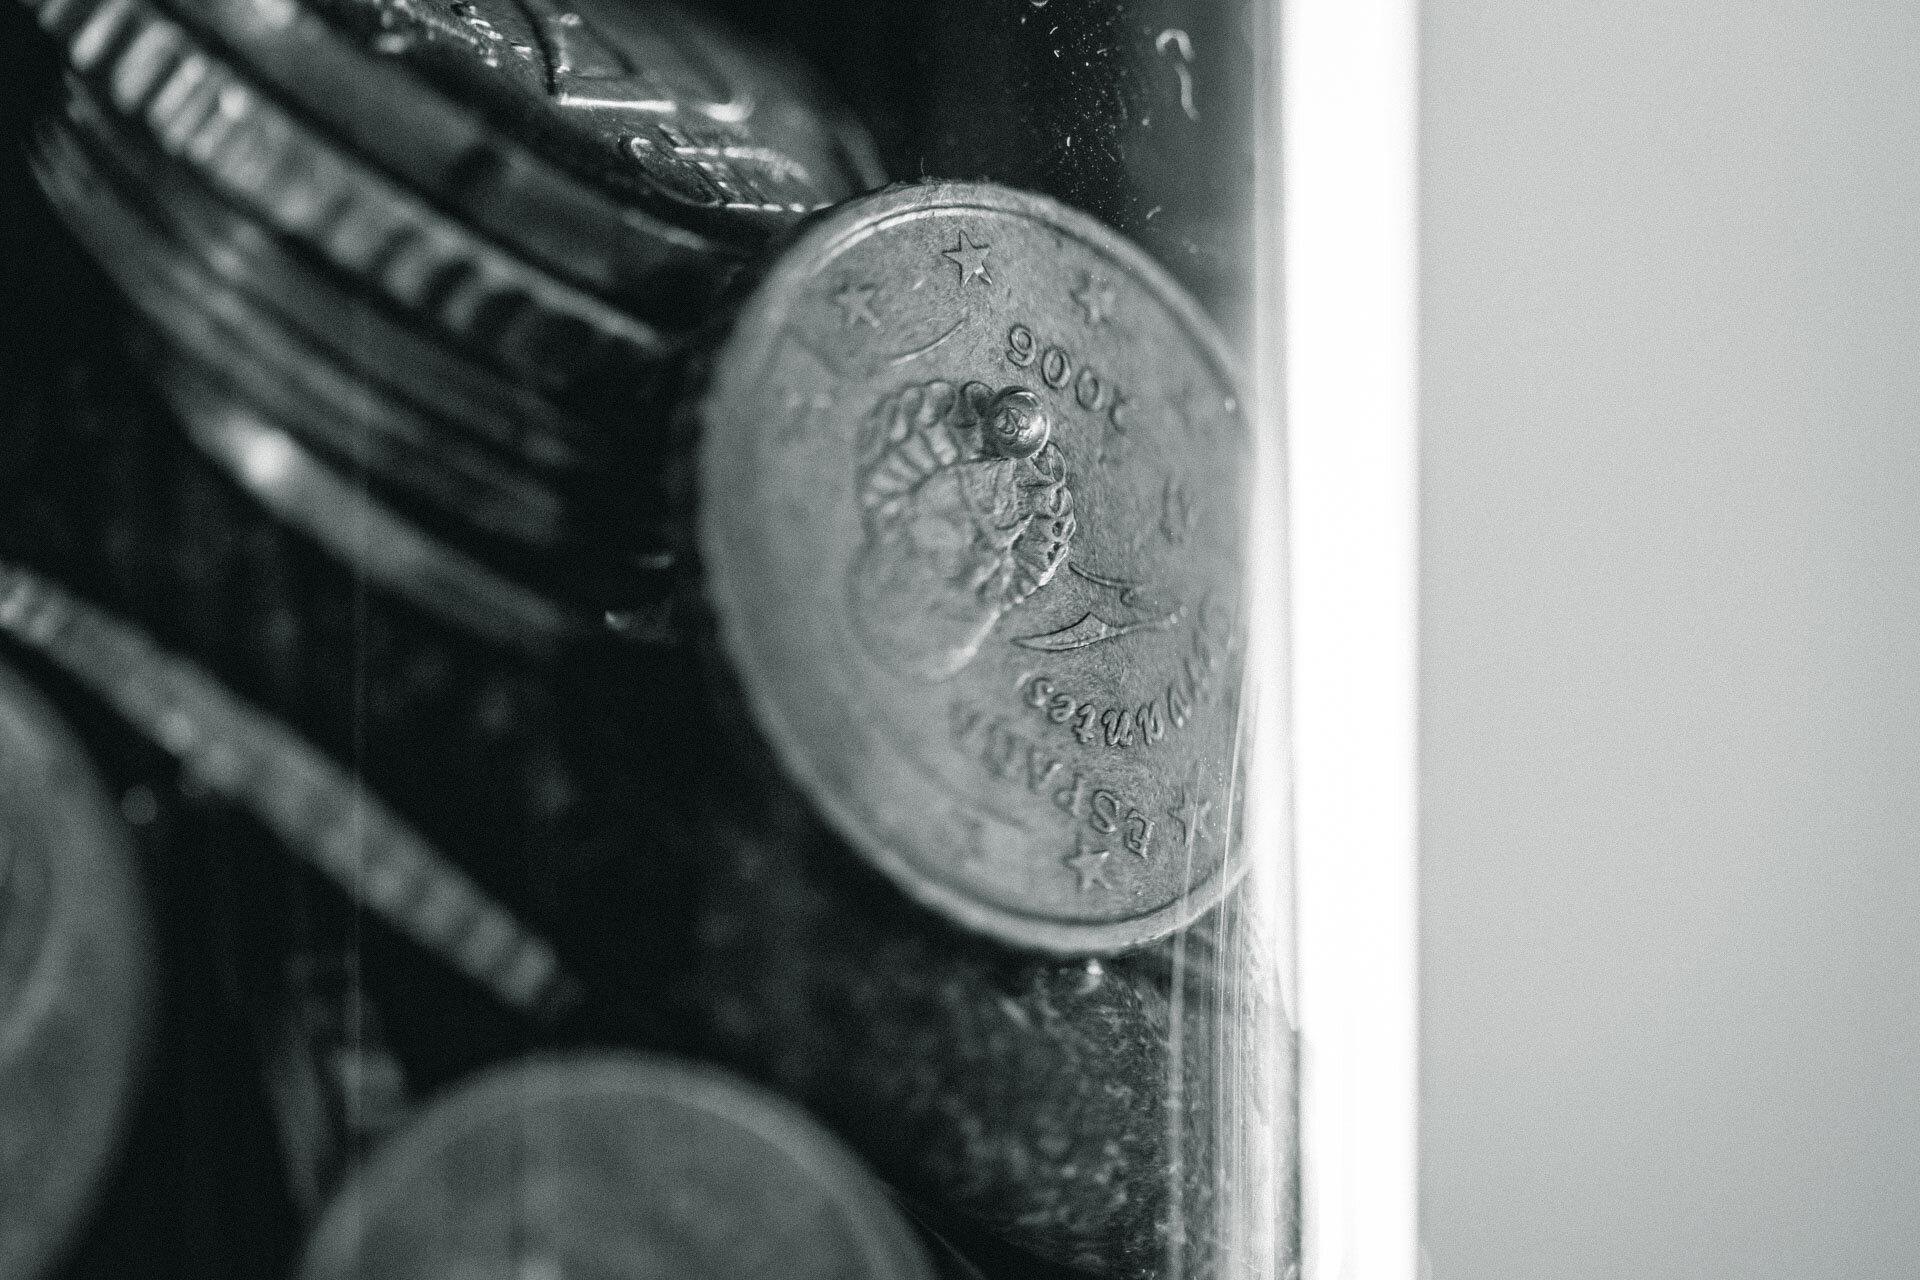 BPP 12 - Coins - IG-4.jpg